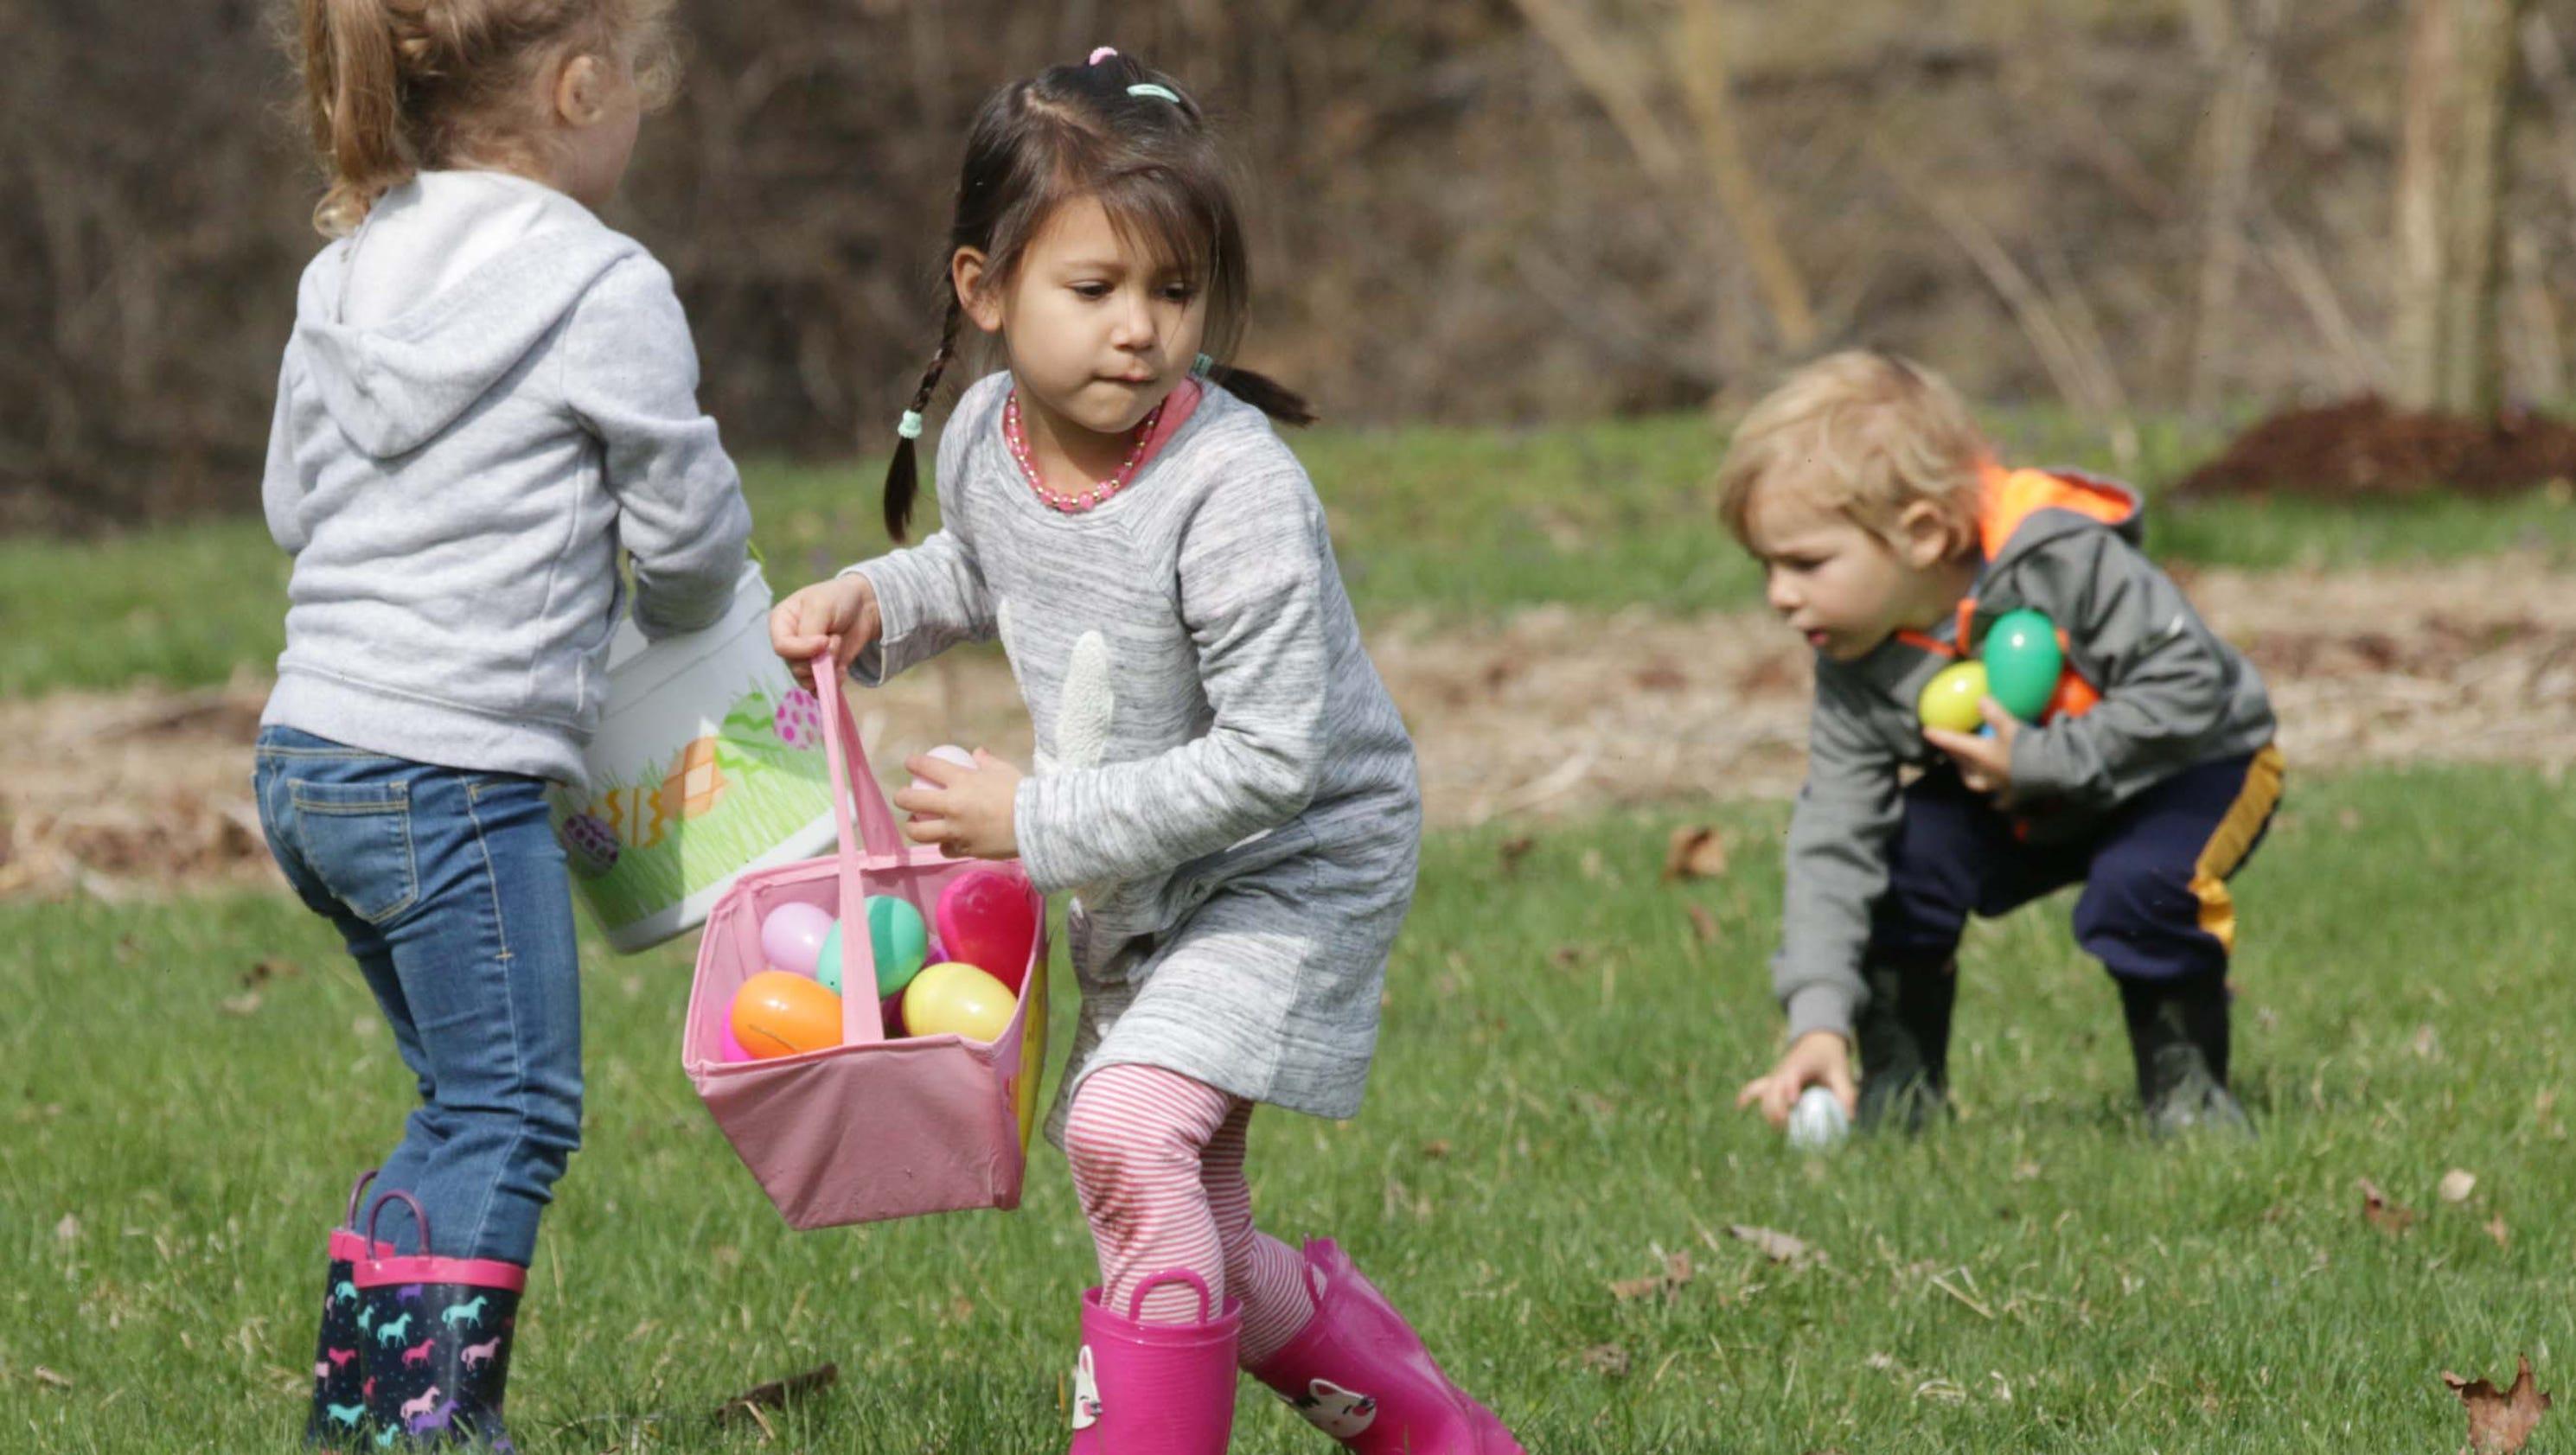 Sheboygan Falls Hocevar Family Hosts Easter Egg Hunt For